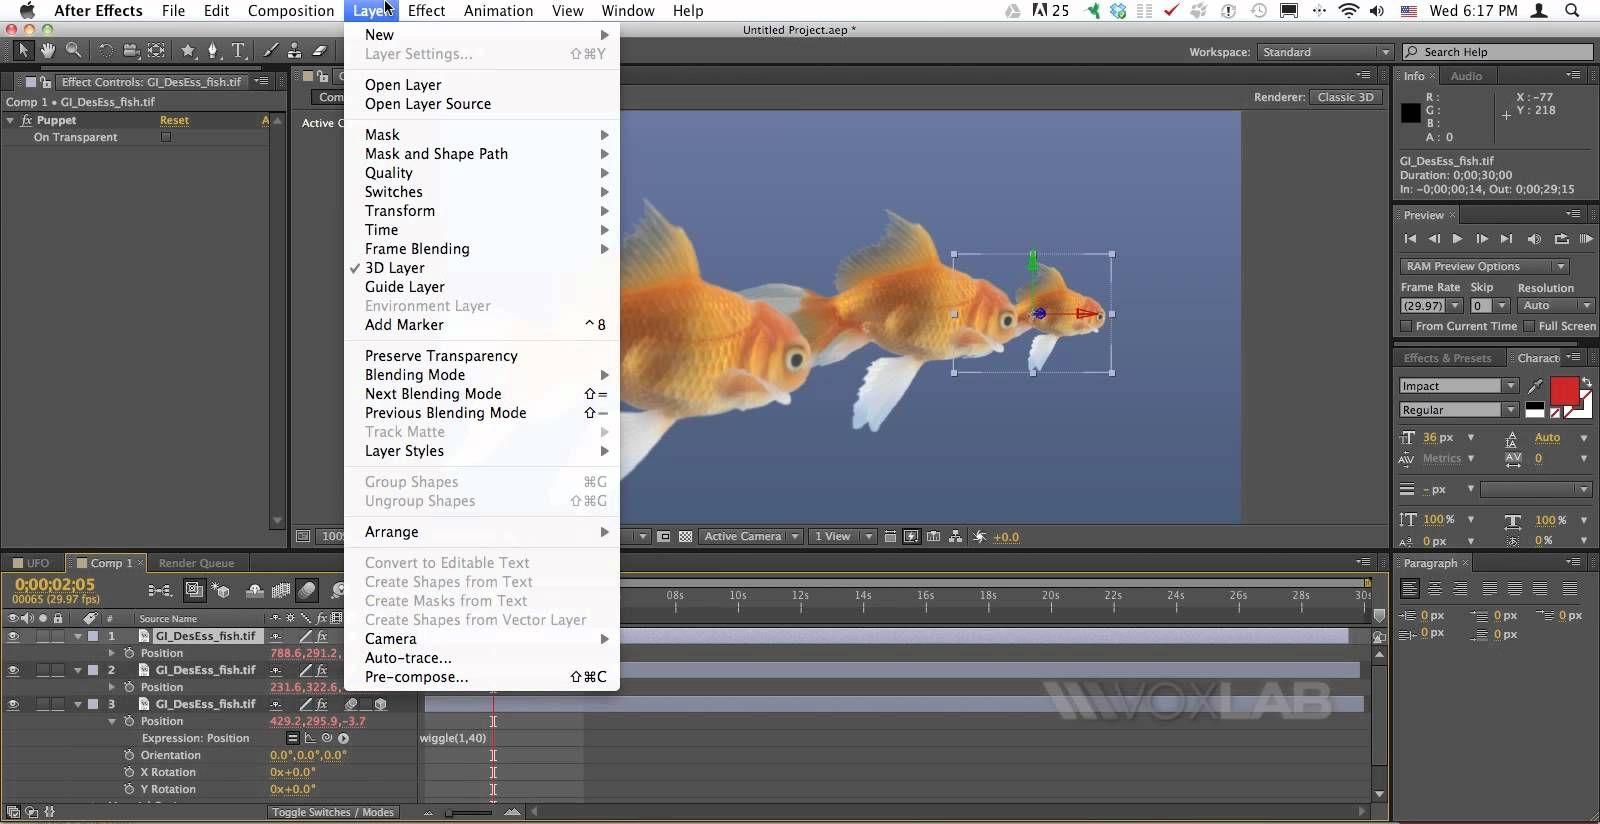 Adobe After Effects Cs6 3d Camera Depth Of Field Tutorial By Voxlab Adobe After Effects Cs6 After Effects Depth Of Field